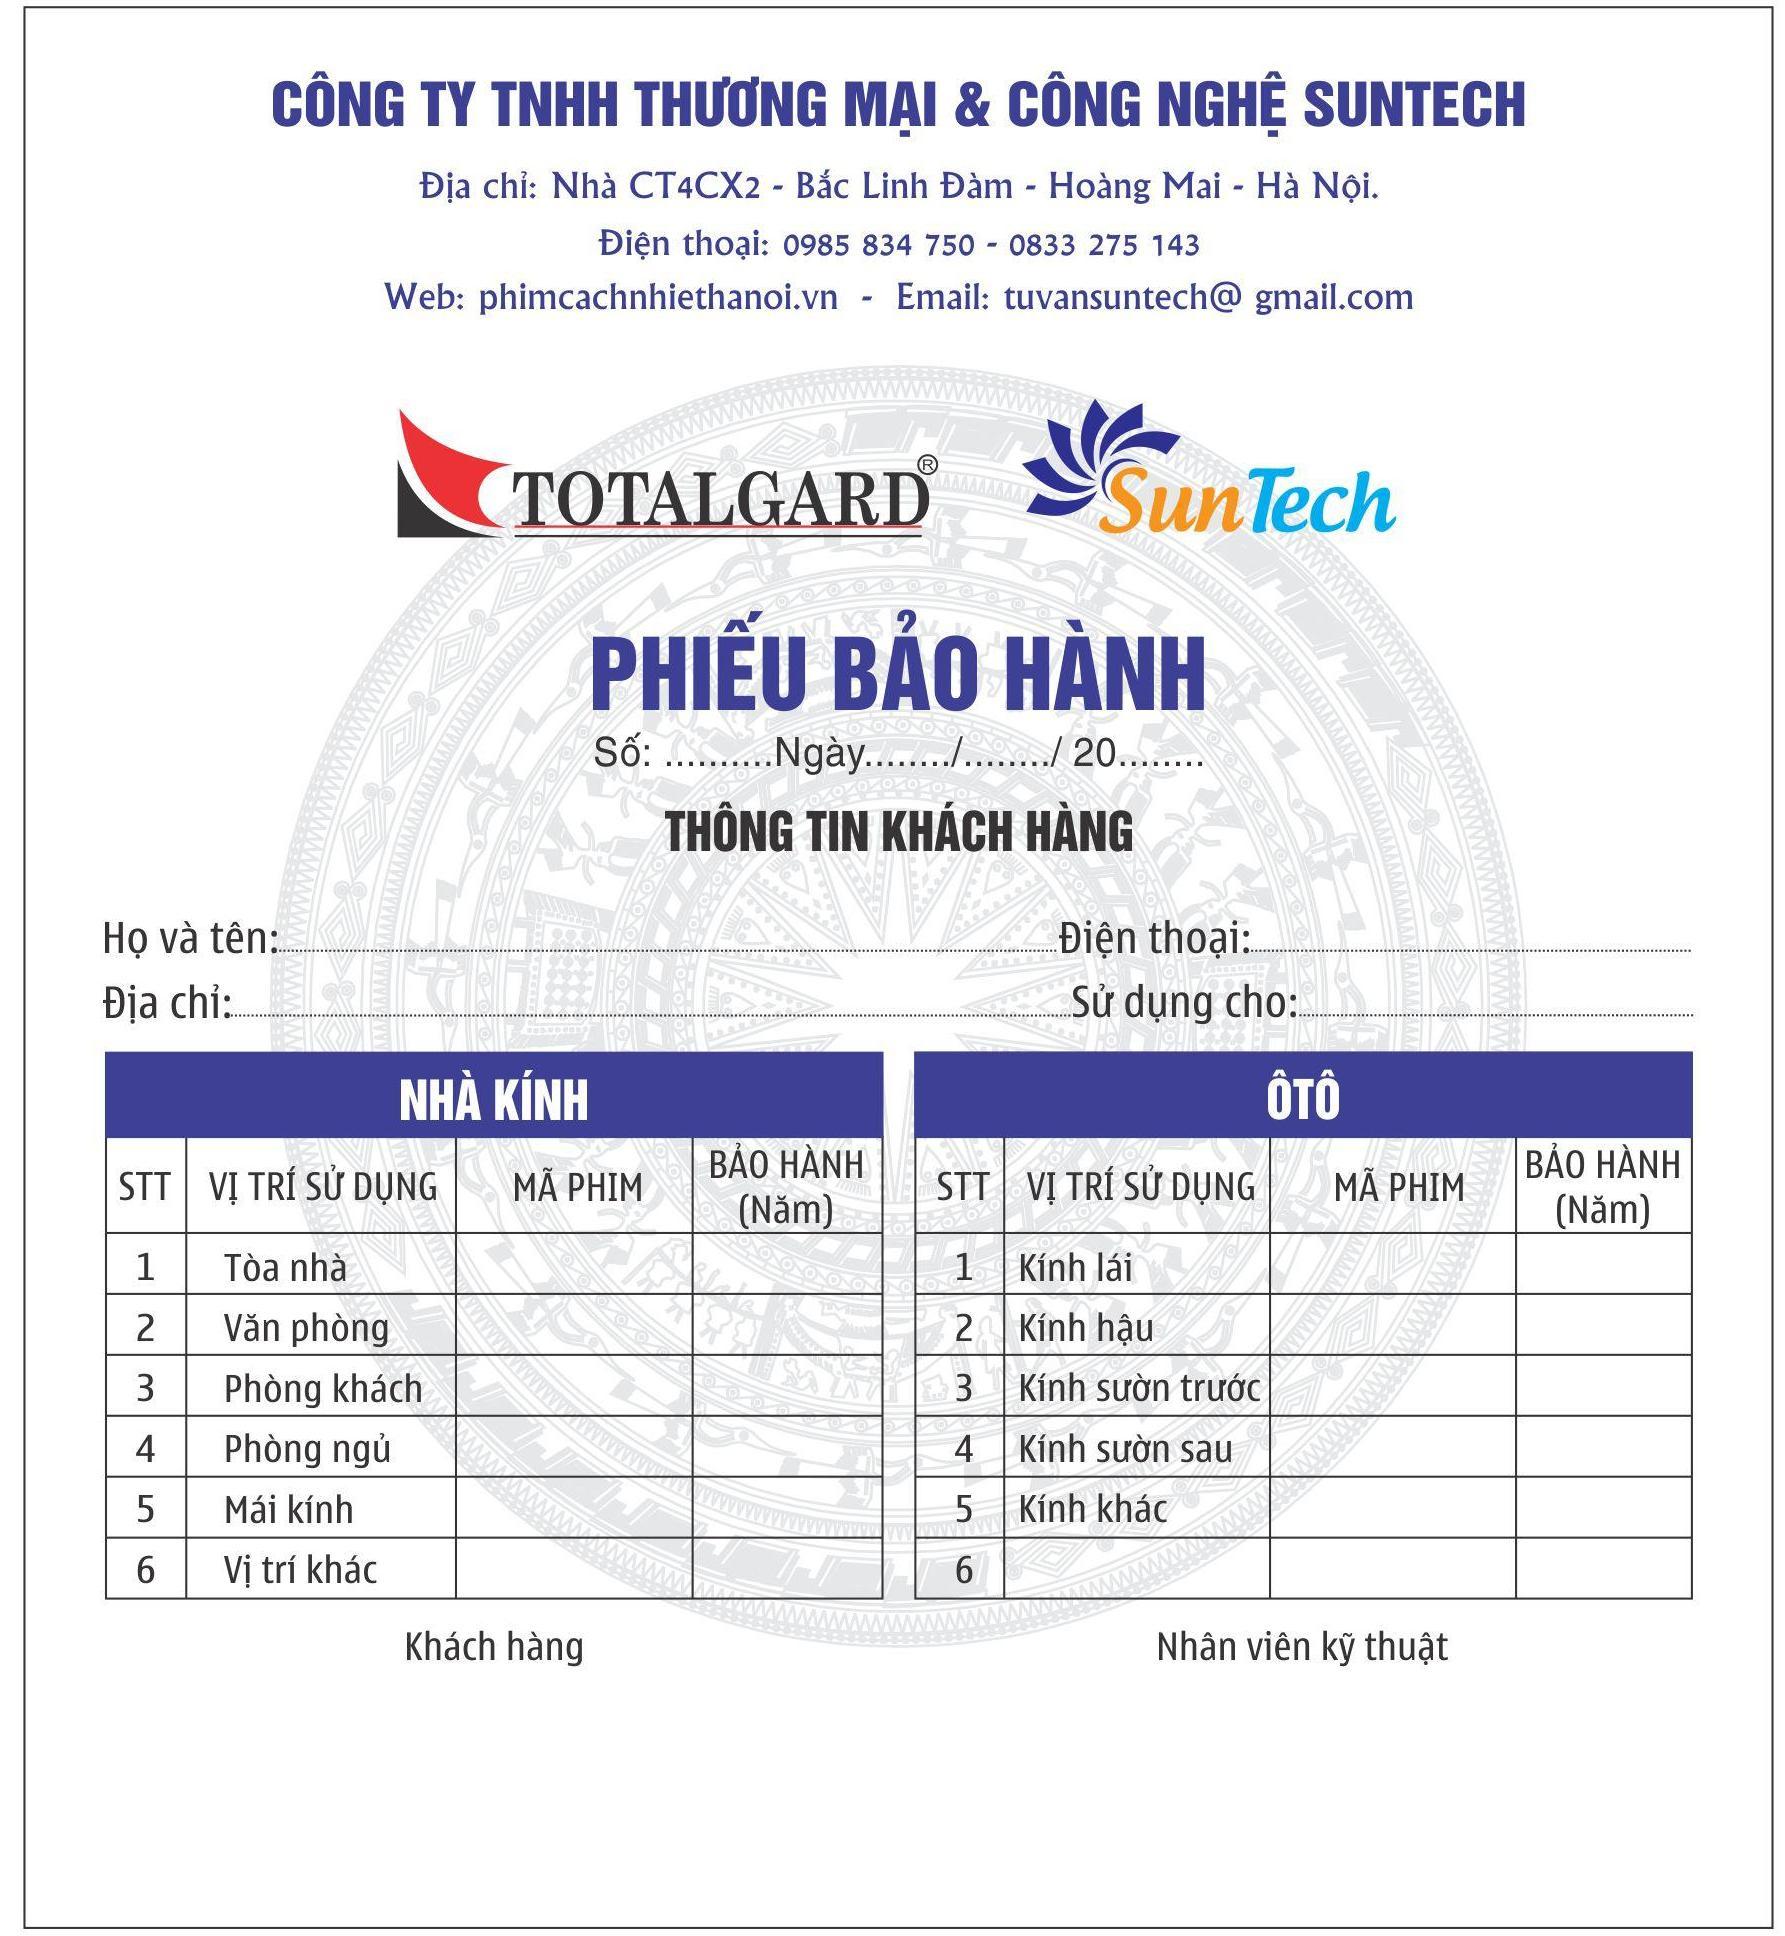 Phieu-Bao-hanh-phim-cach-nhiet-sutech